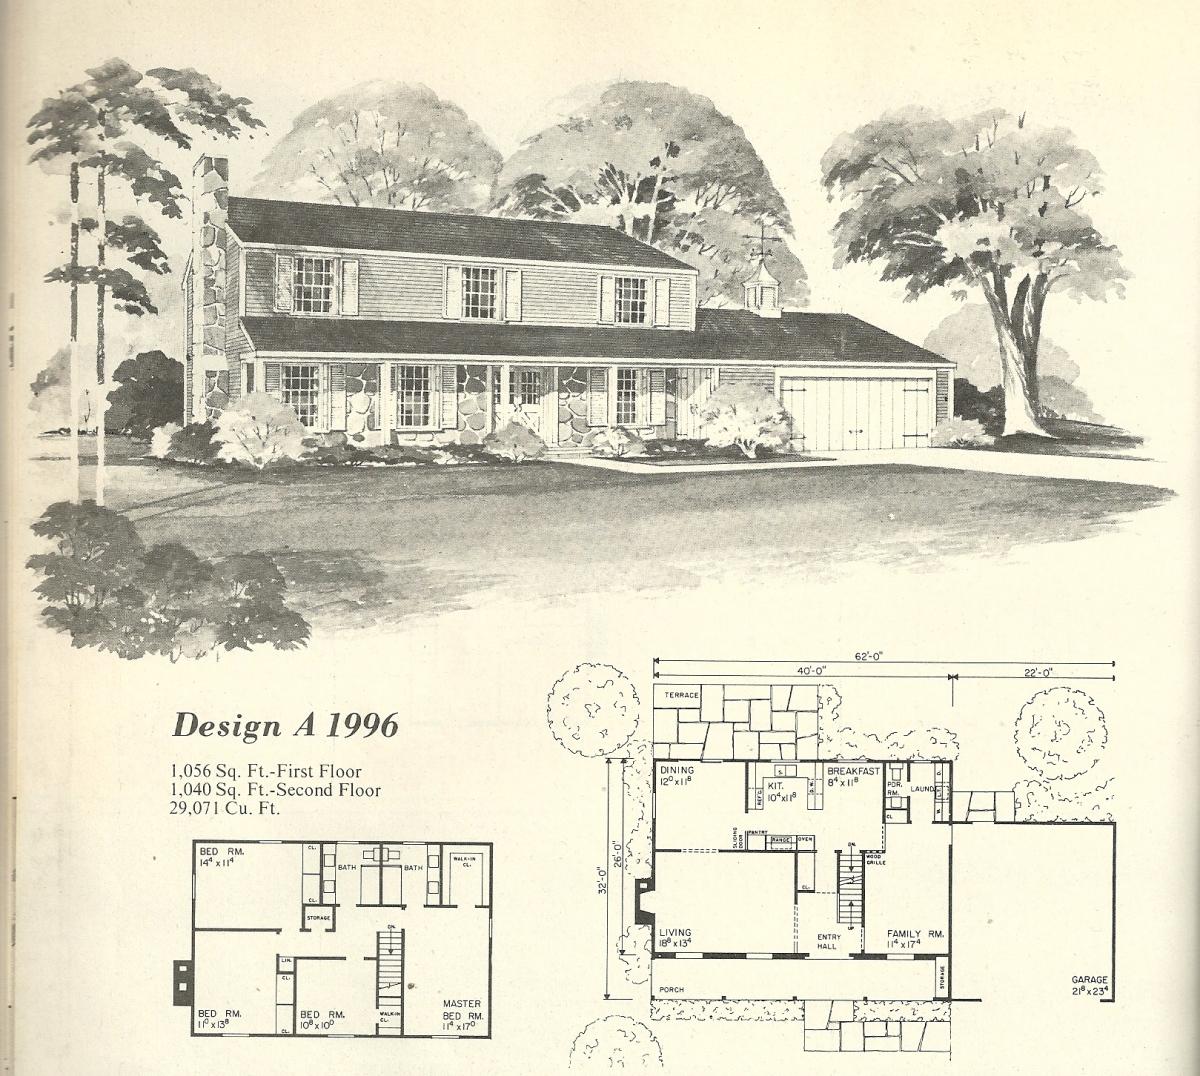 vintage house plans, mid century house plans, mid century homes